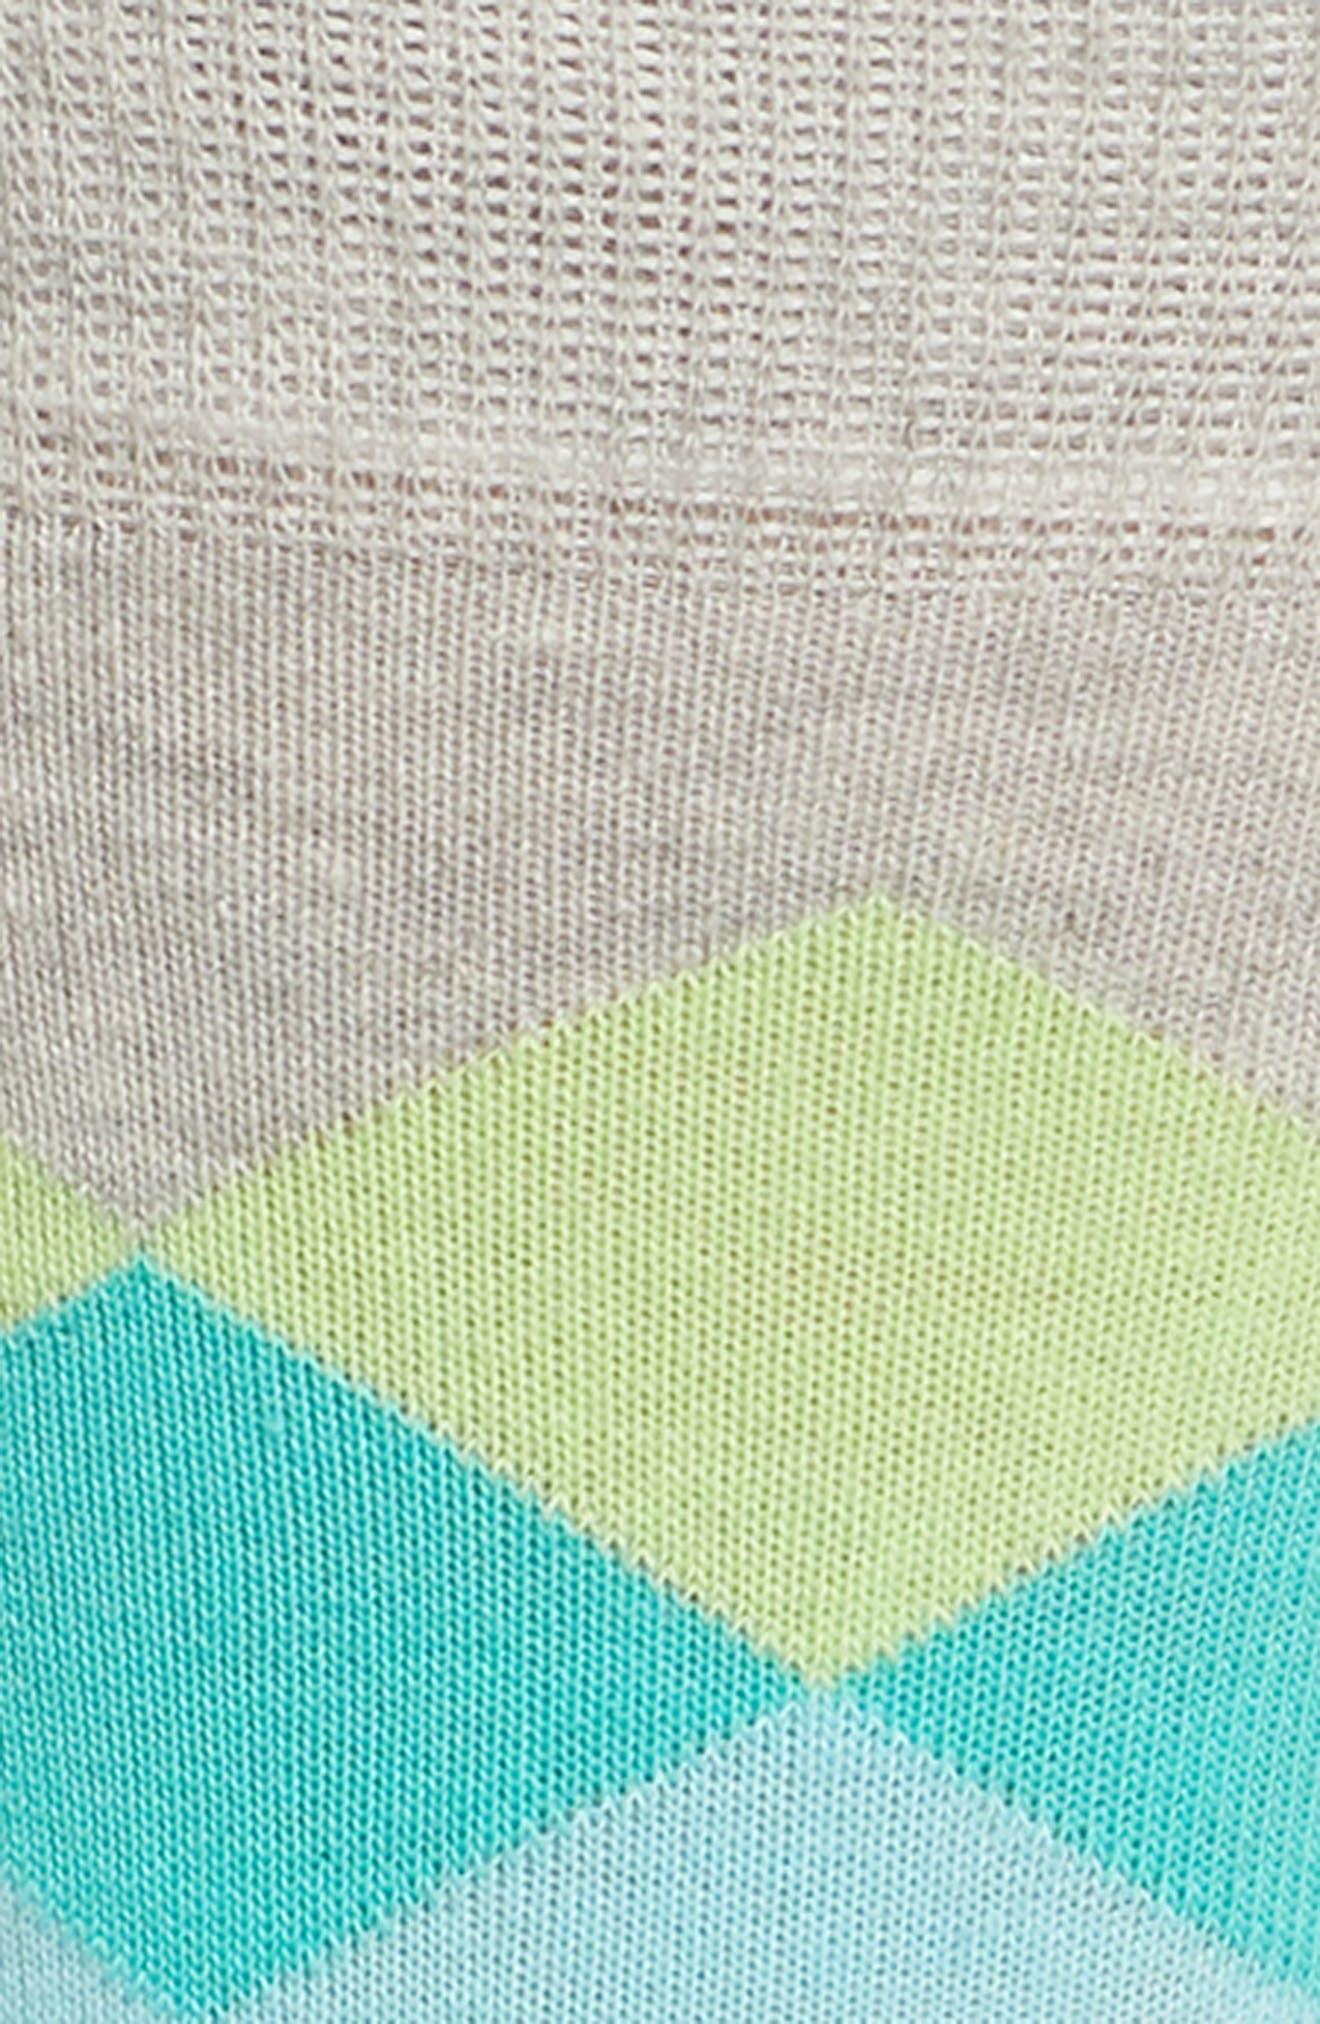 Faded Diamond Crew Socks,                             Alternate thumbnail 2, color,                             Blk/ Bright